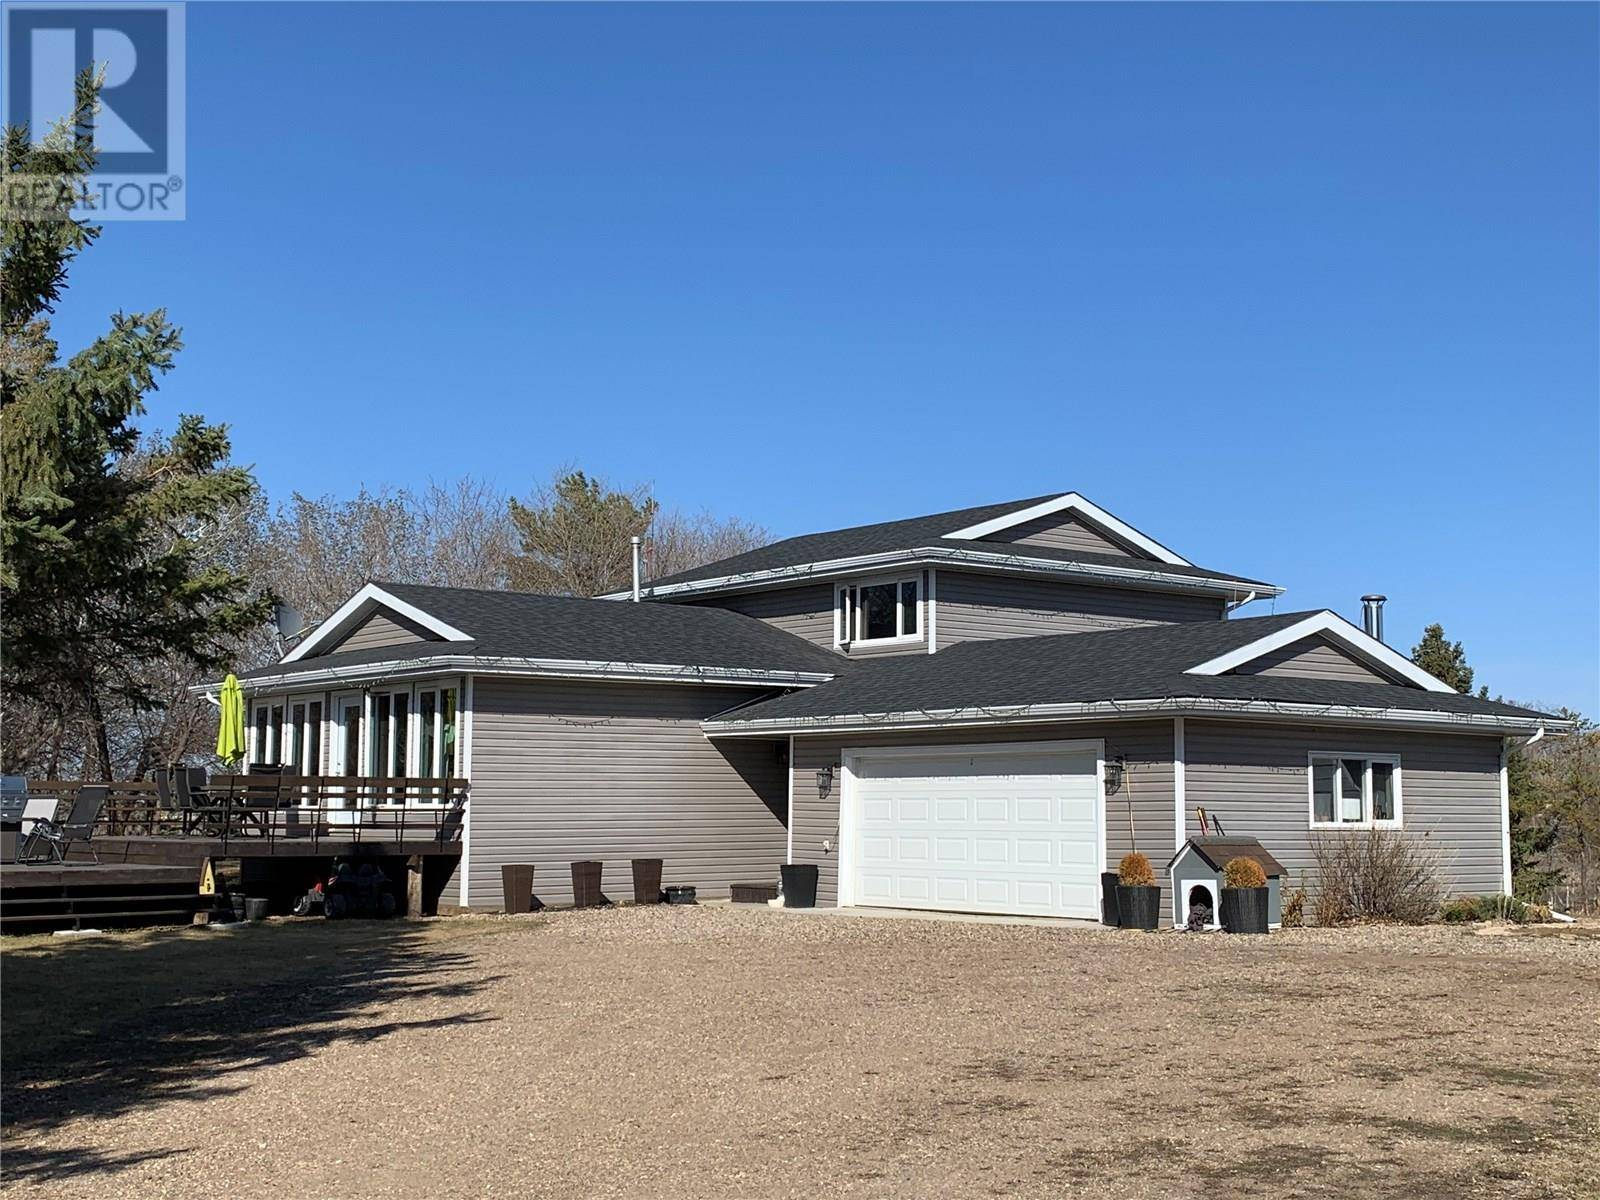 House for sale at 12 Mile Rd Prince Albert Rm No. 461 Saskatchewan - MLS: SK798677